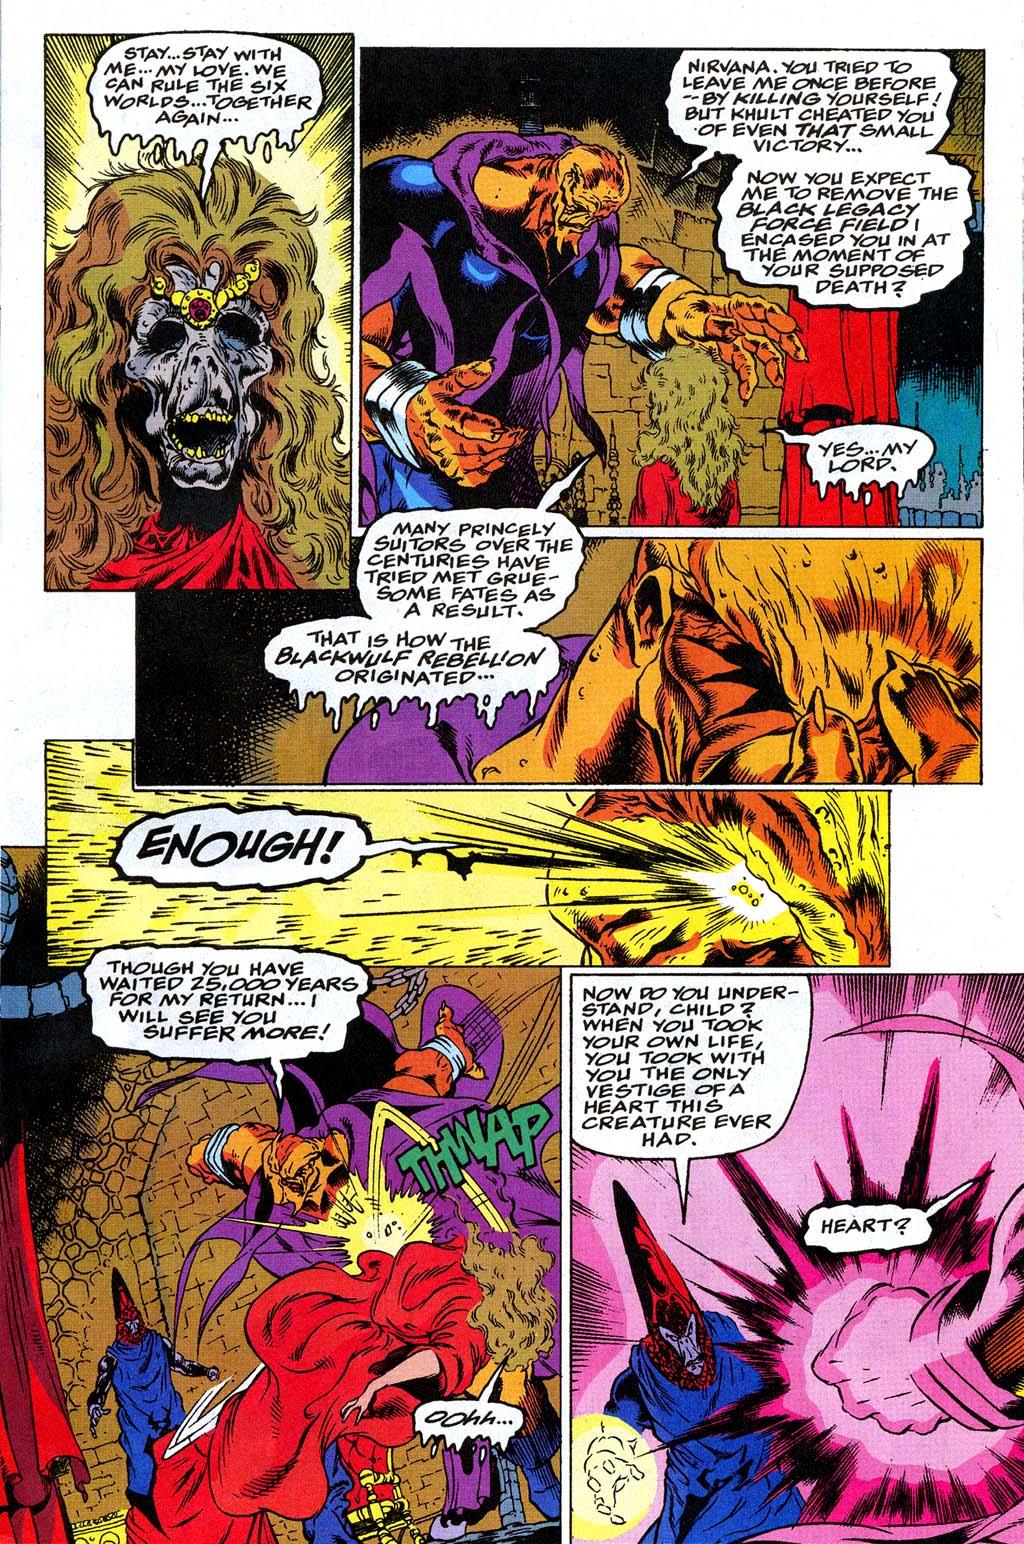 Read online Blackwulf comic -  Issue #9 - 6